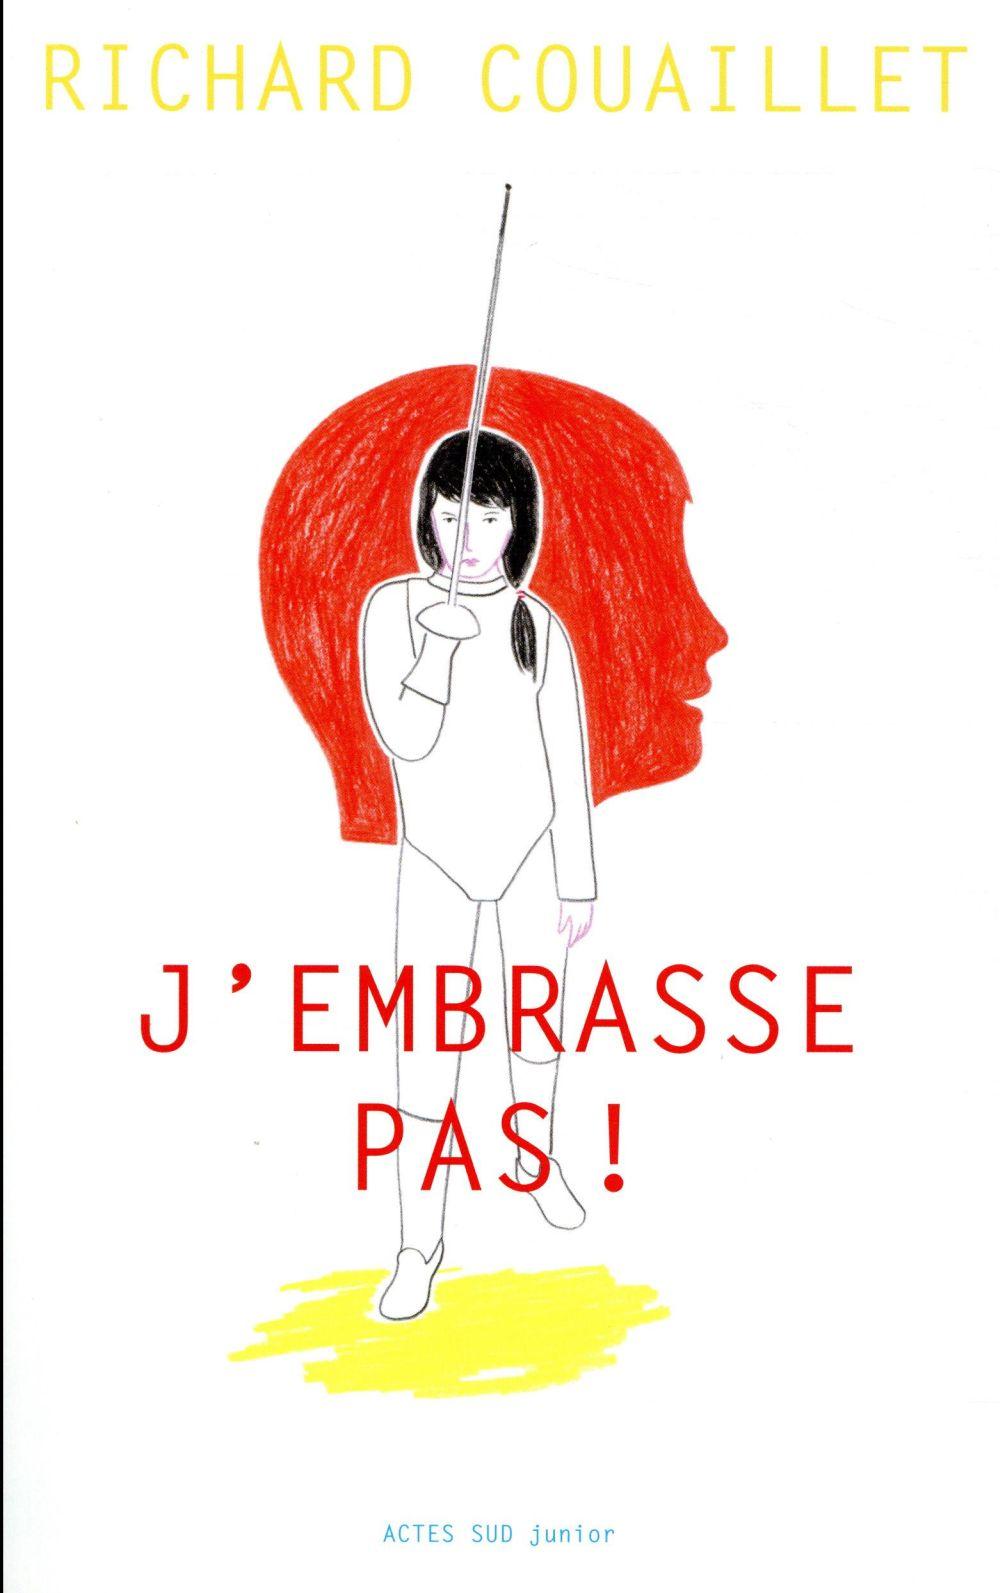 J-EMBRASSE PAS